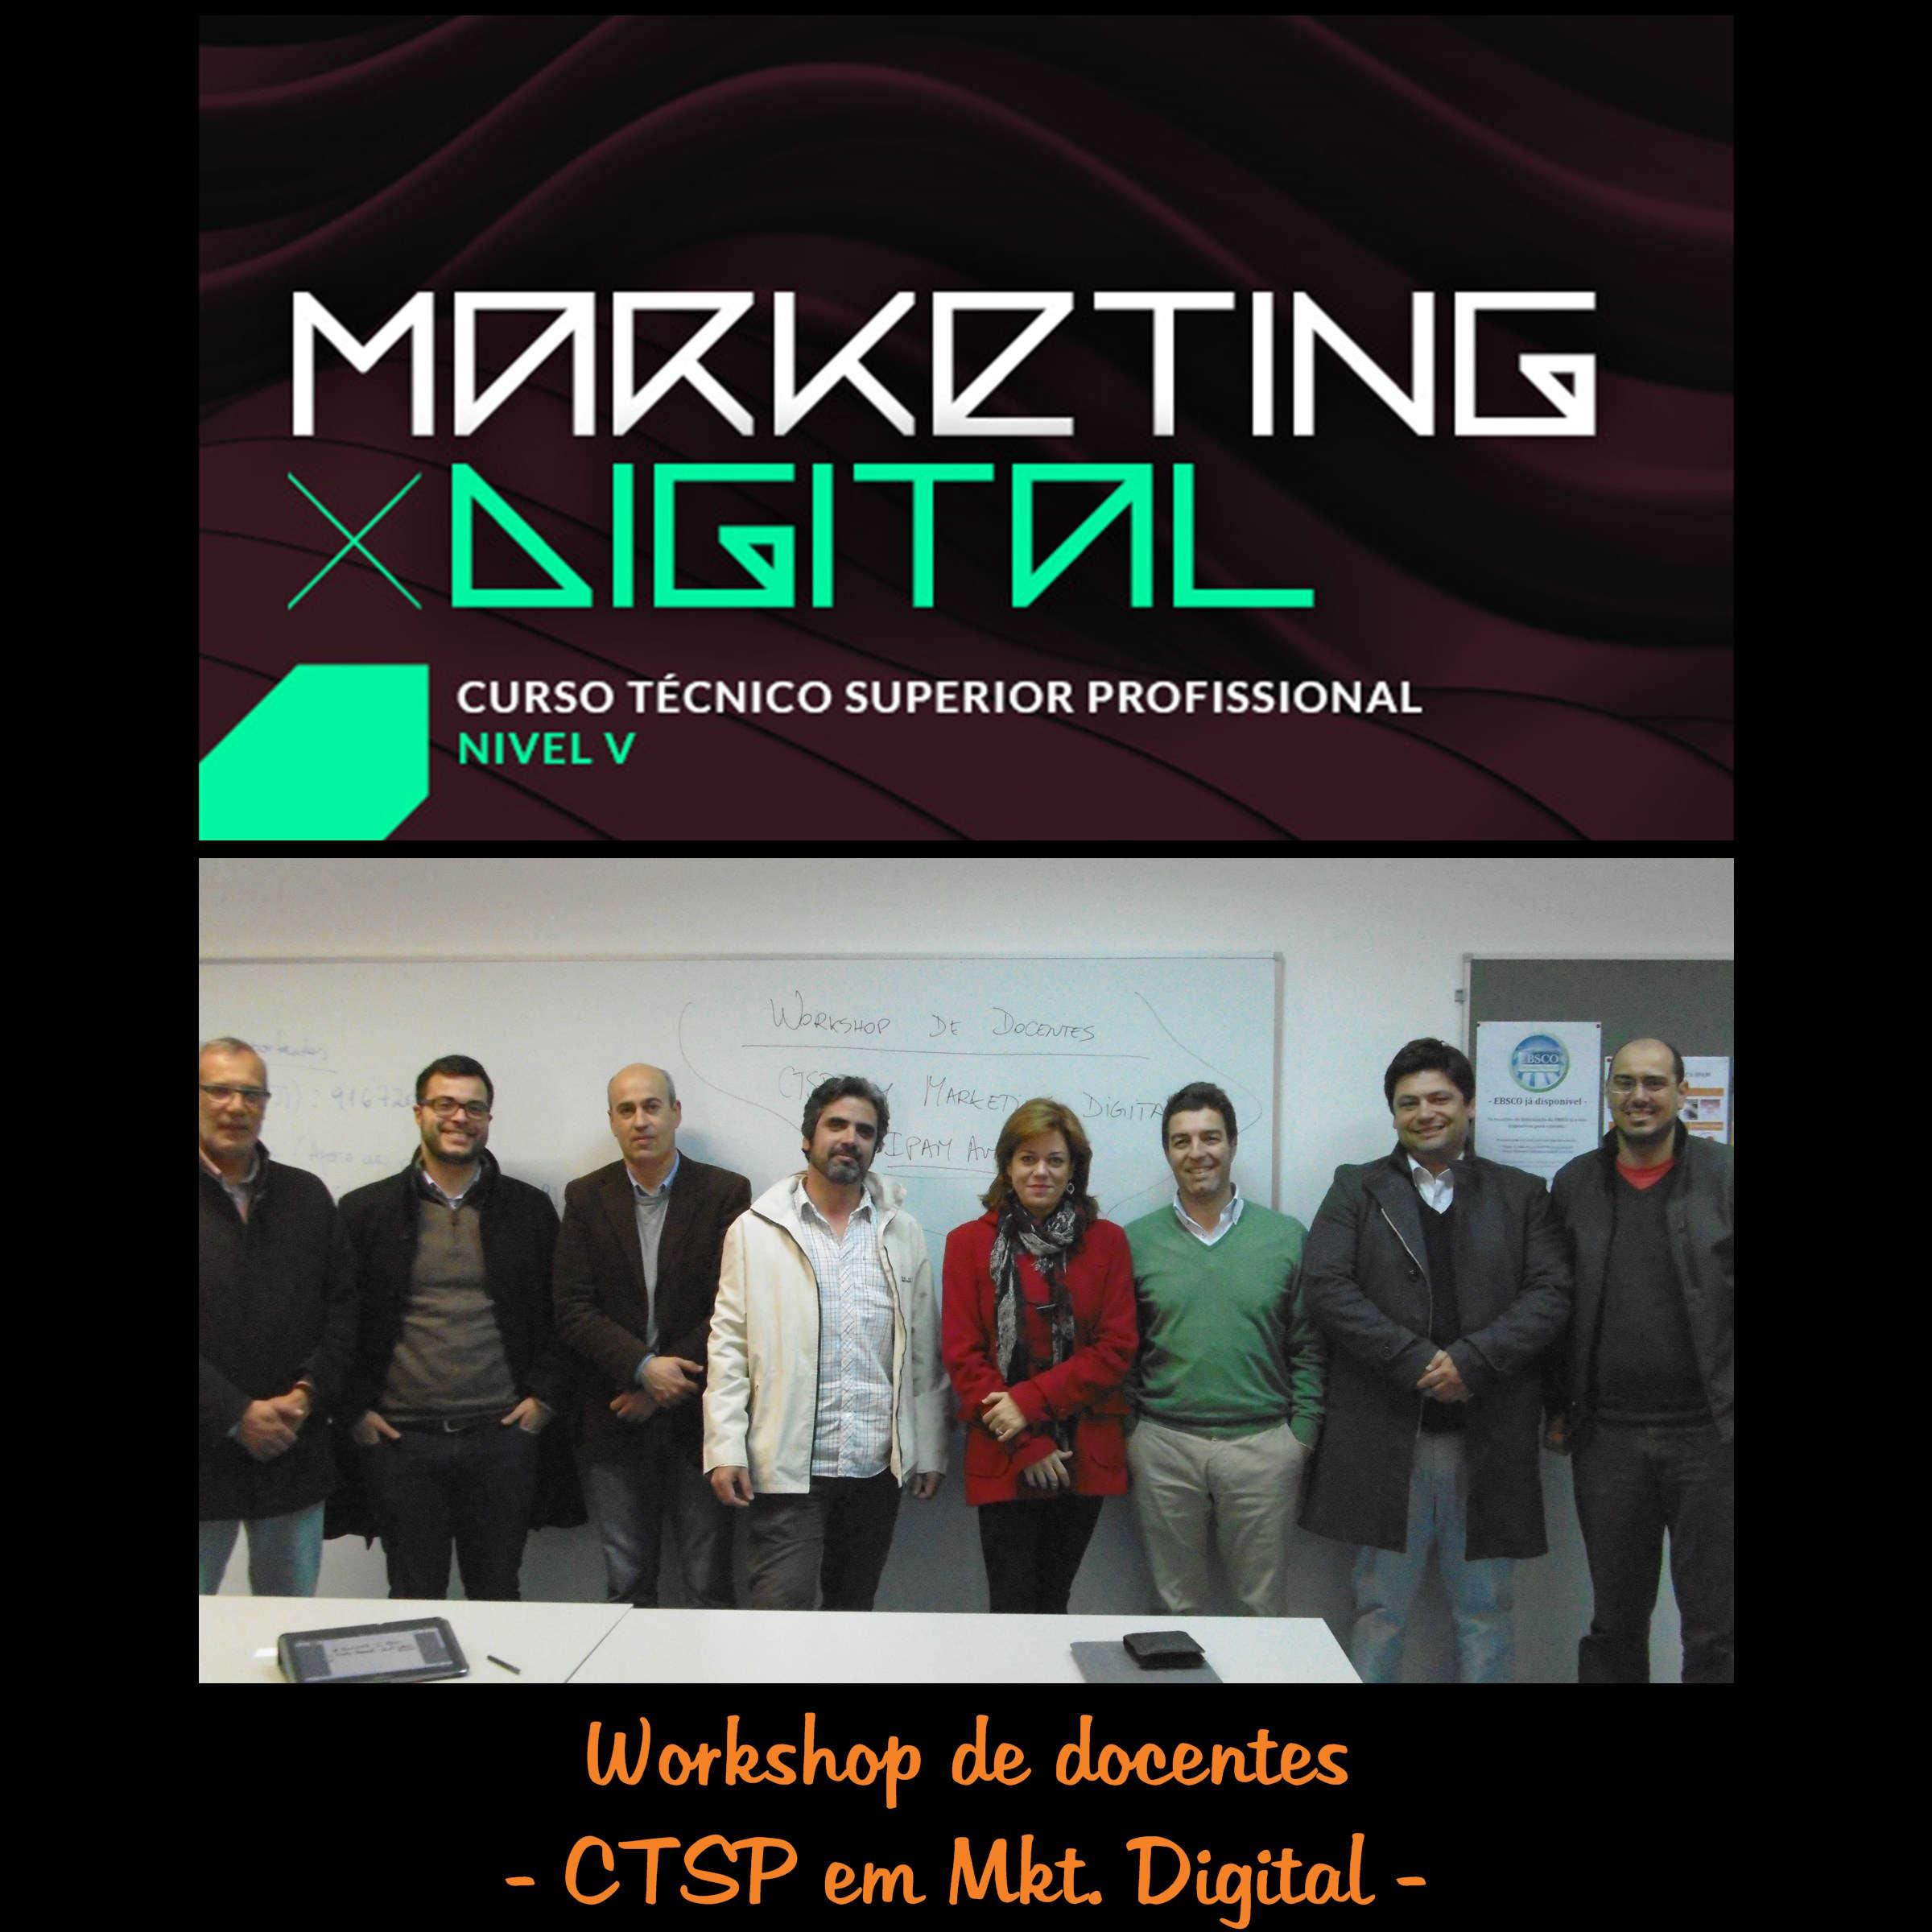 Marketing digital IPAM Aveiro Plano